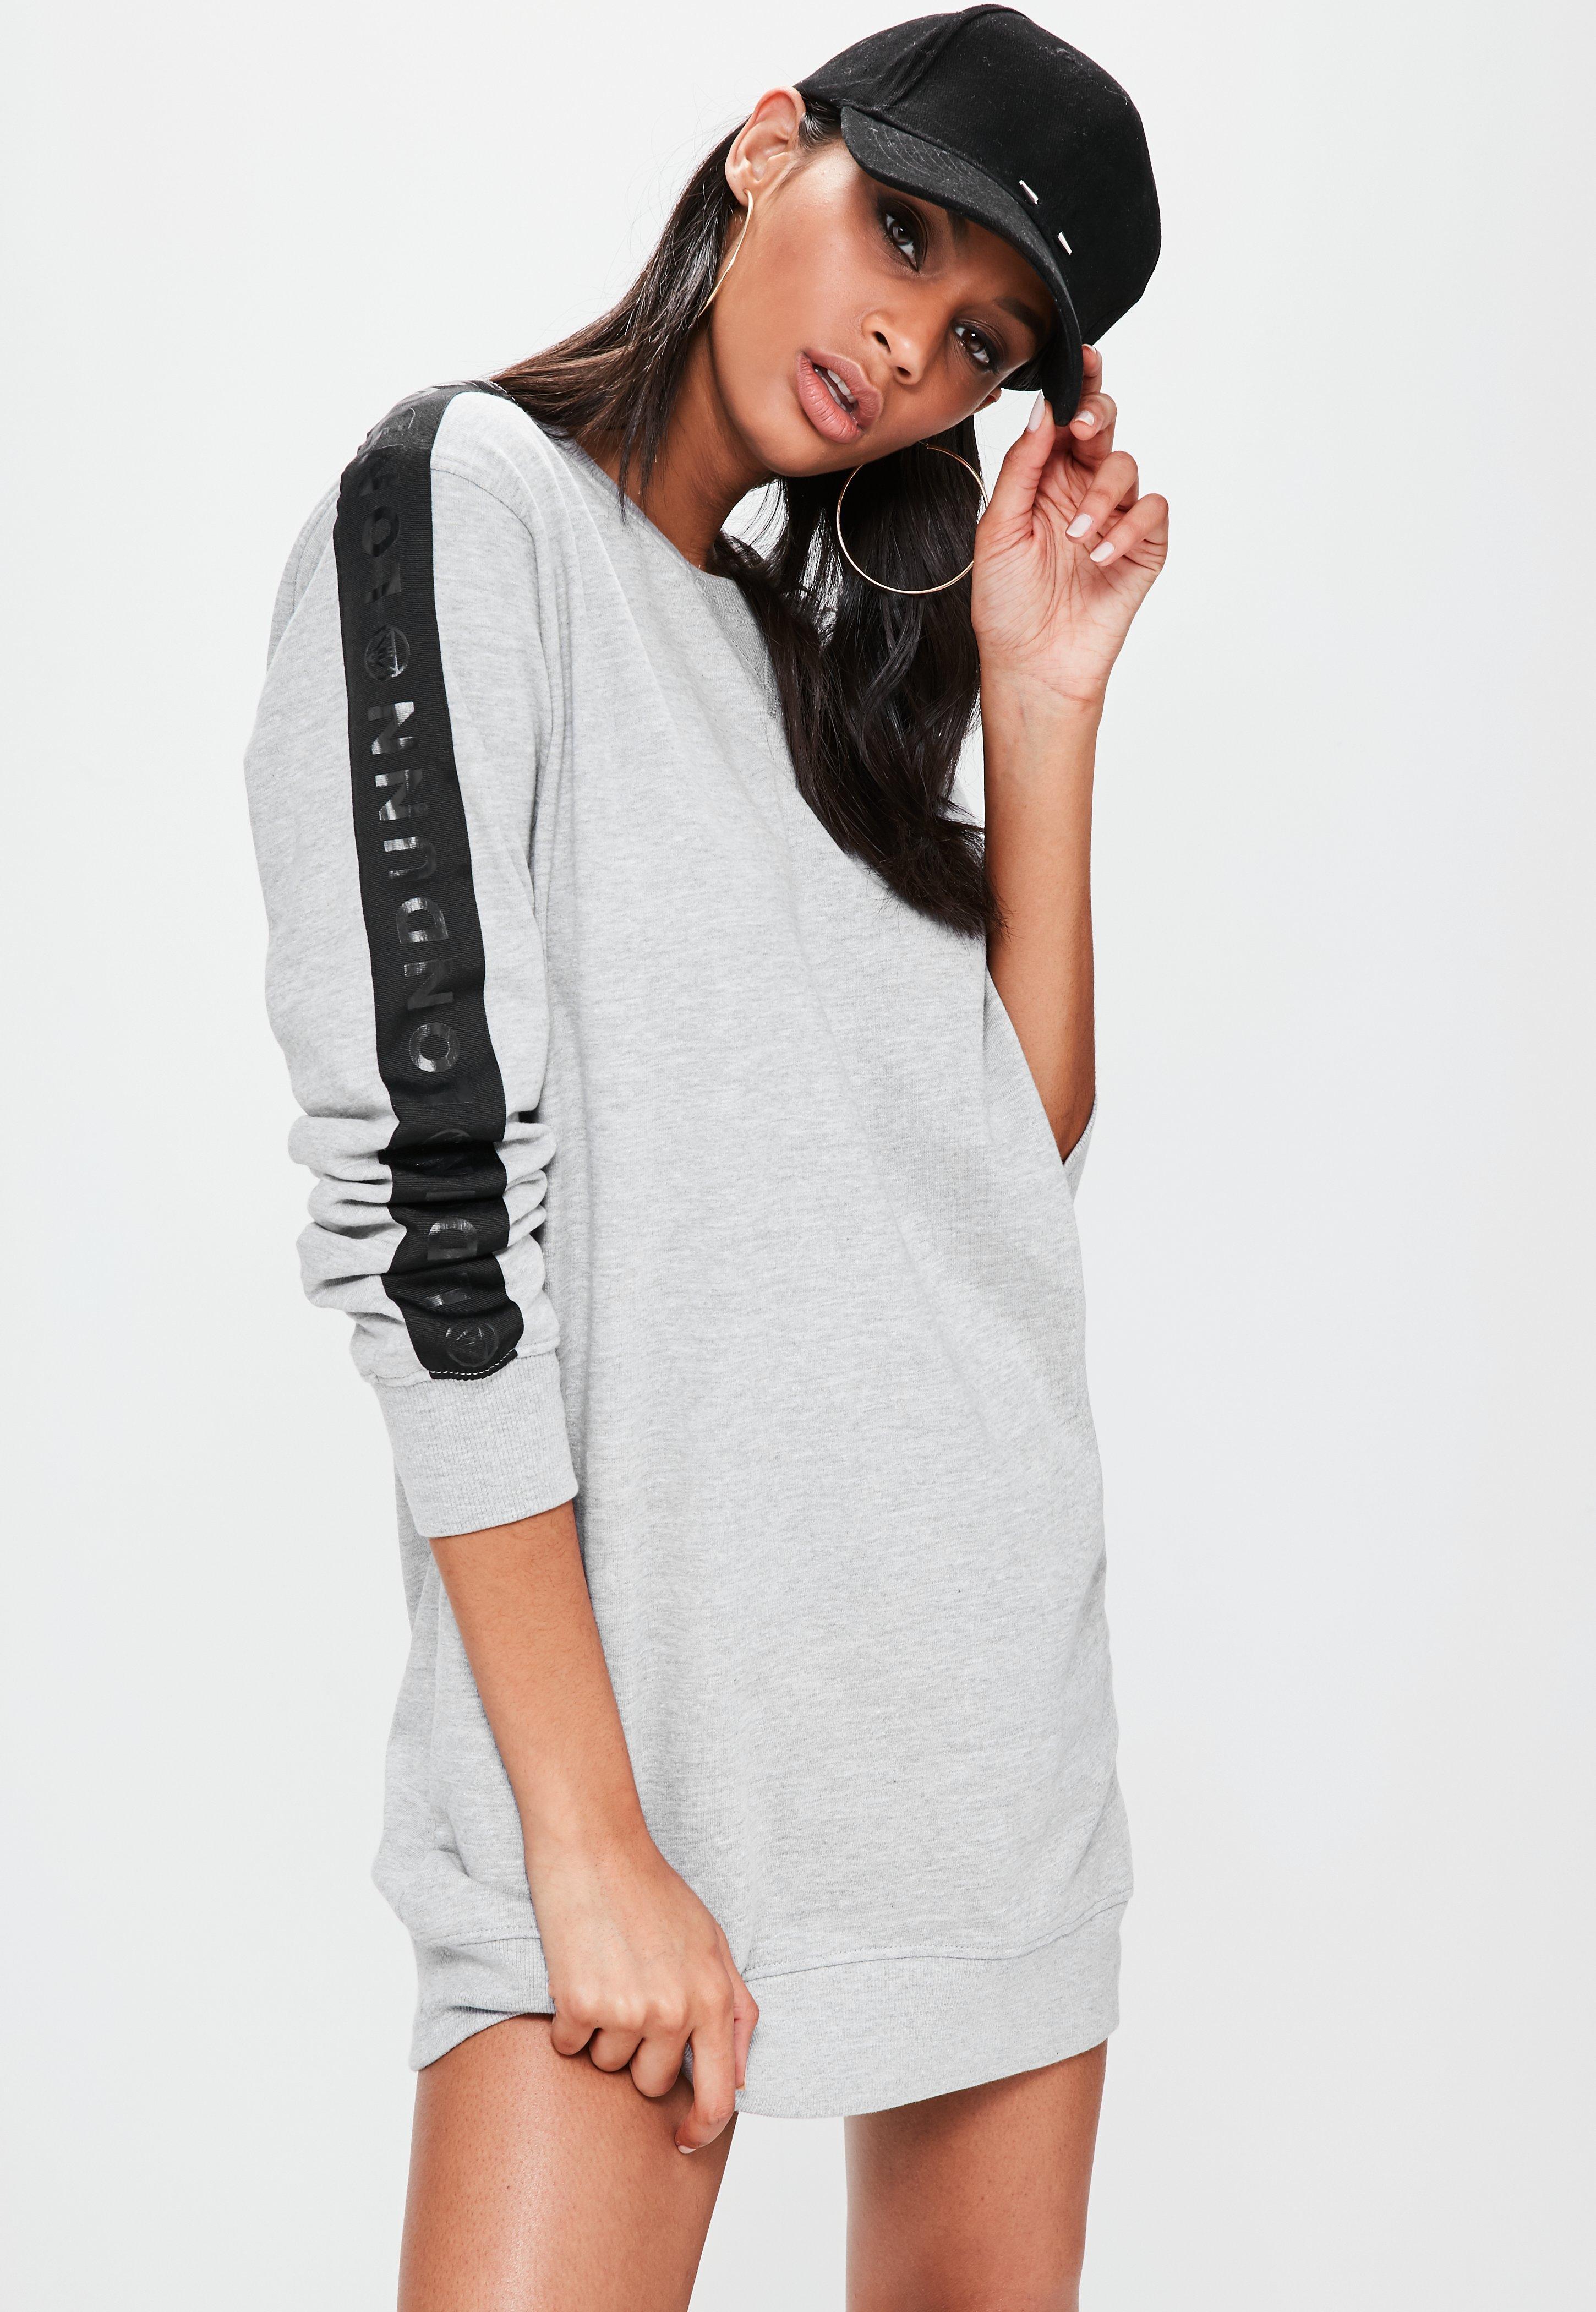 Discount Footlocker Buy Cheap In China Missguided California Oversized Sweater Dress g8tXe